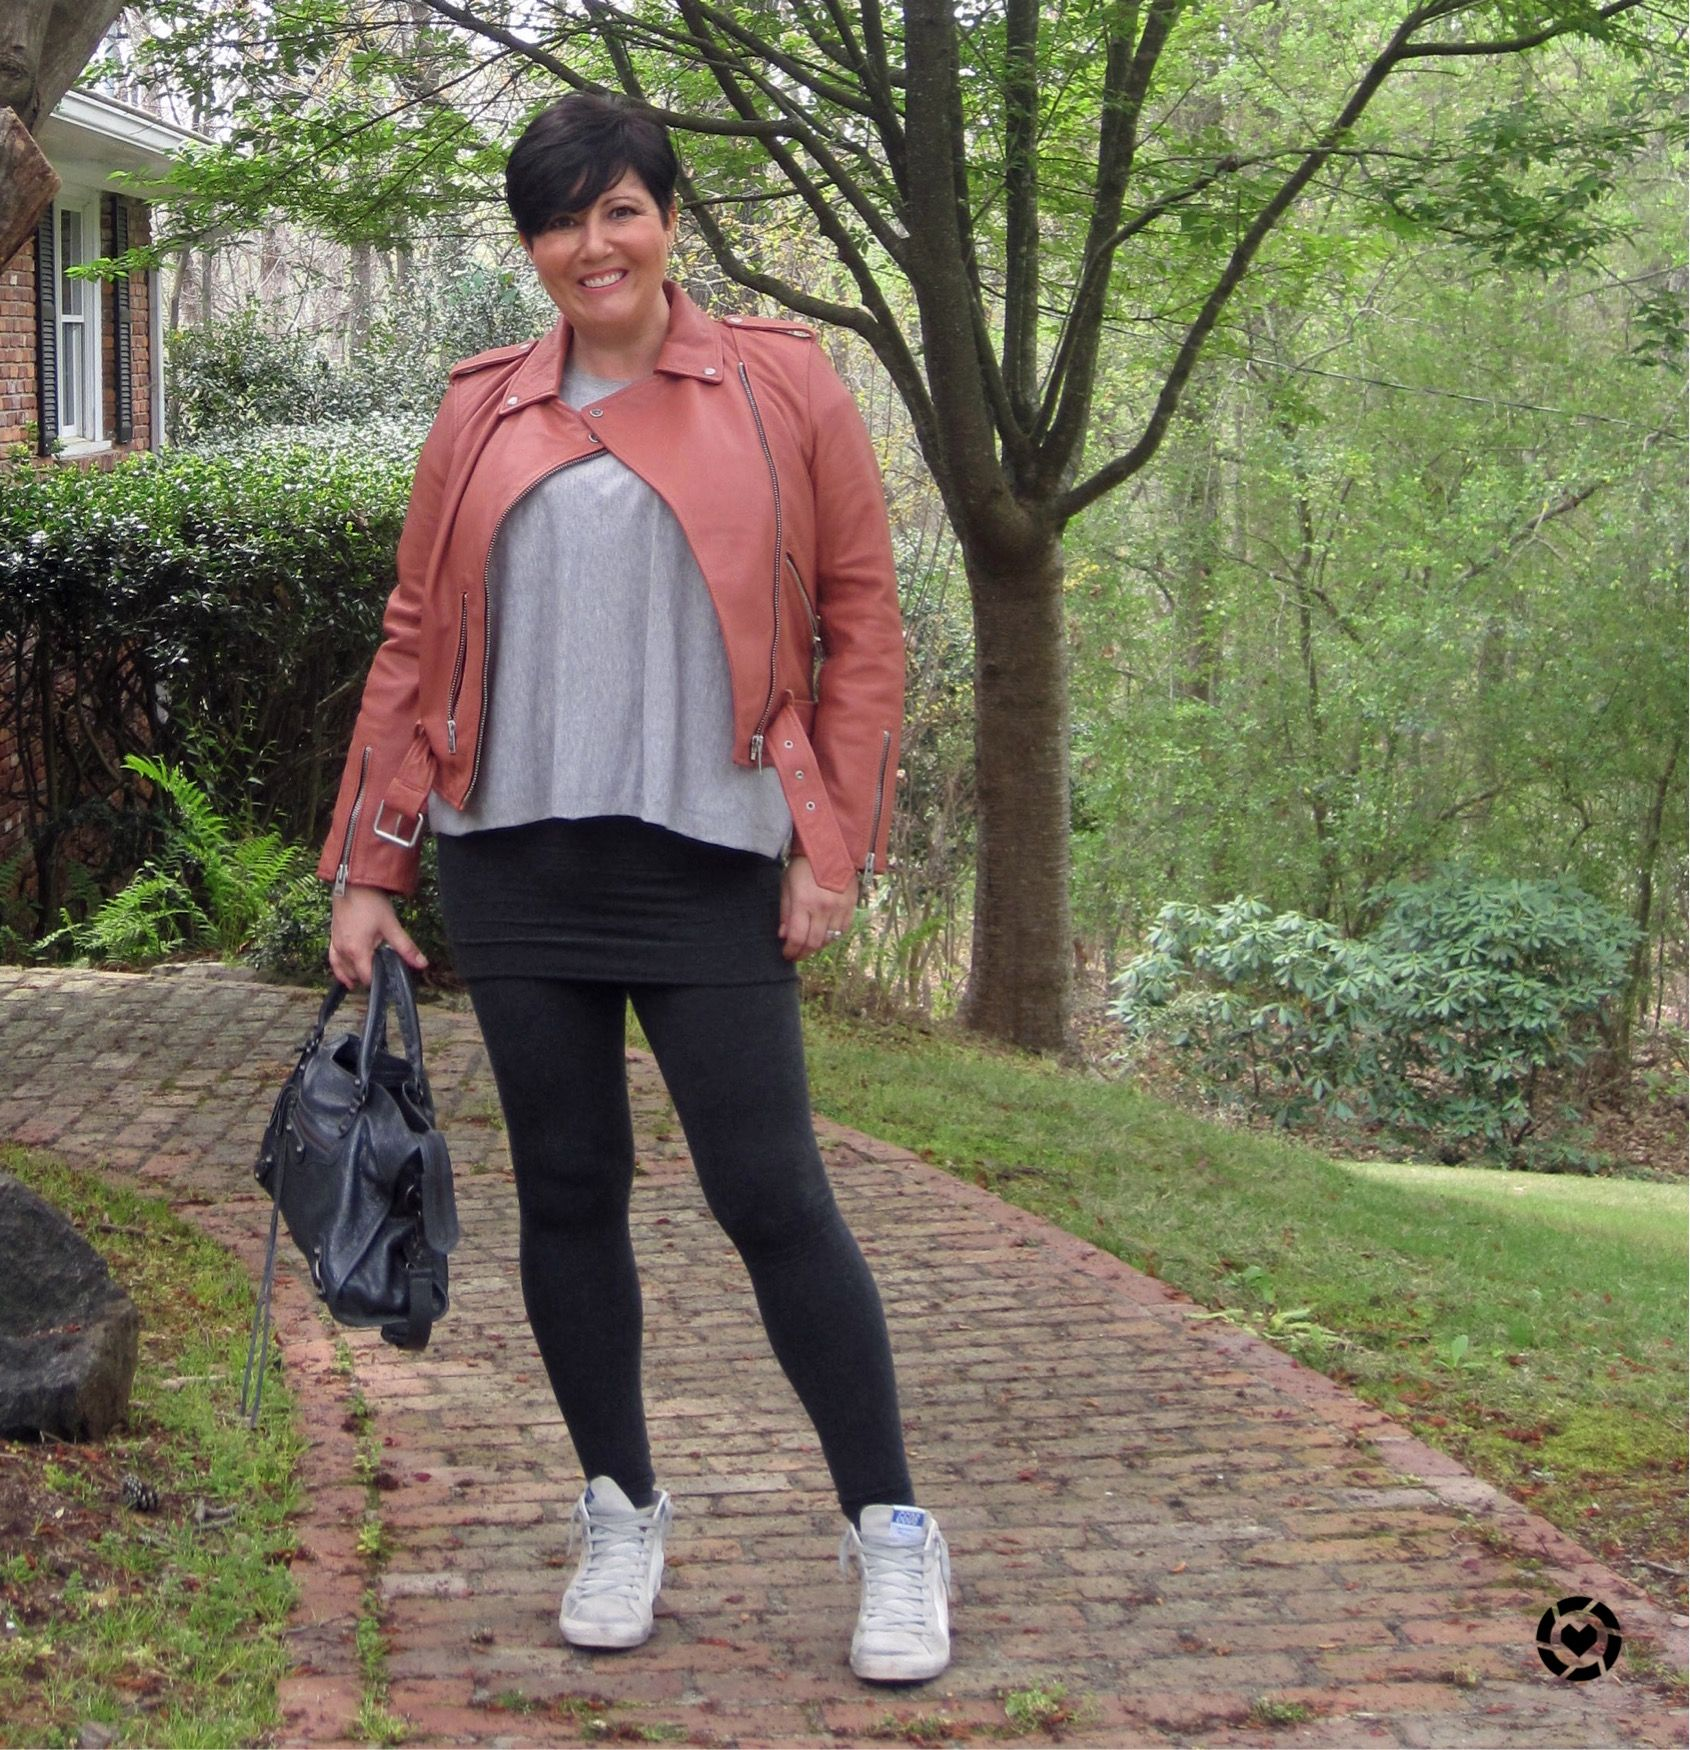 58b2f3532e446 Allsaints jacket with raffi leggings and balenciaga bag | Poppy's ...